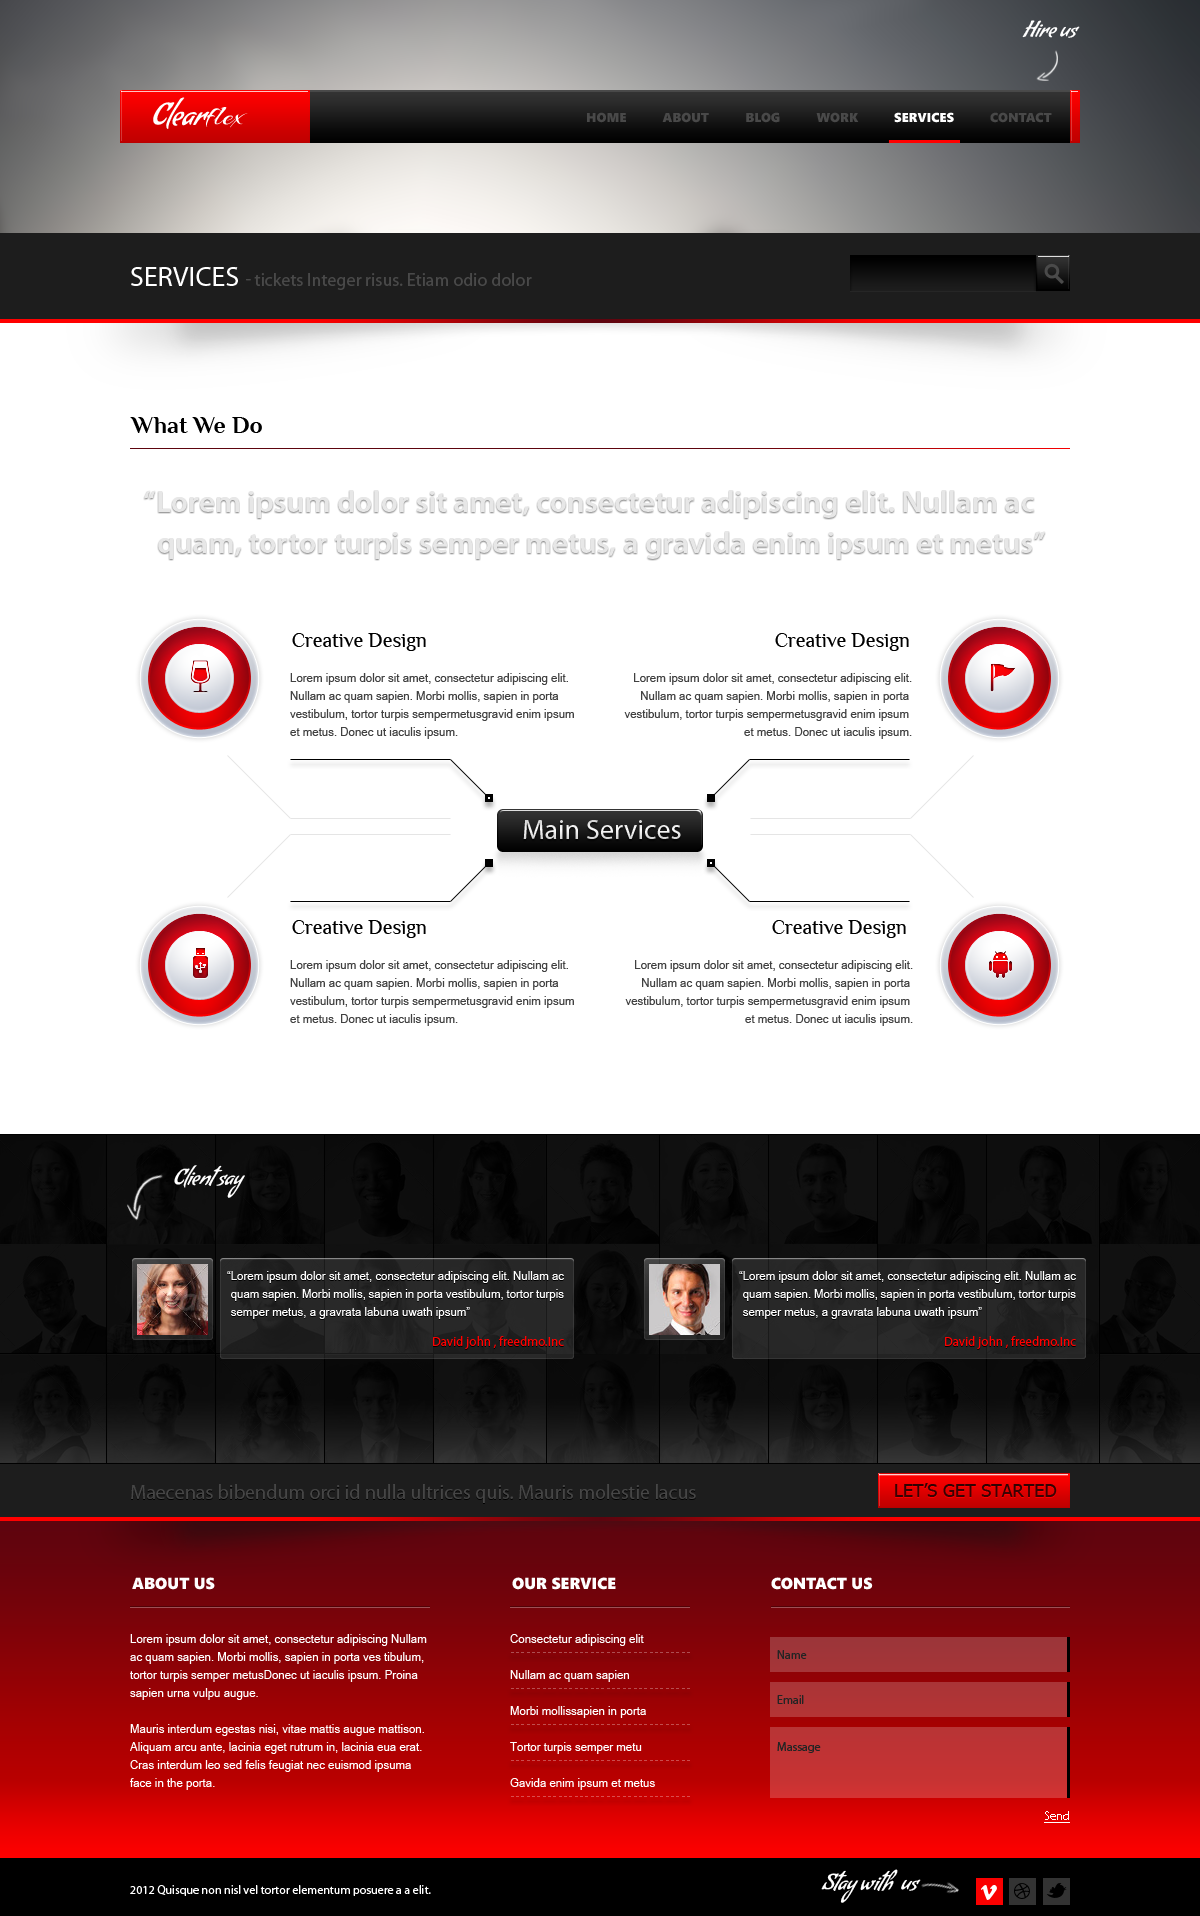 Clearflex PSD Templates - 10_Service page